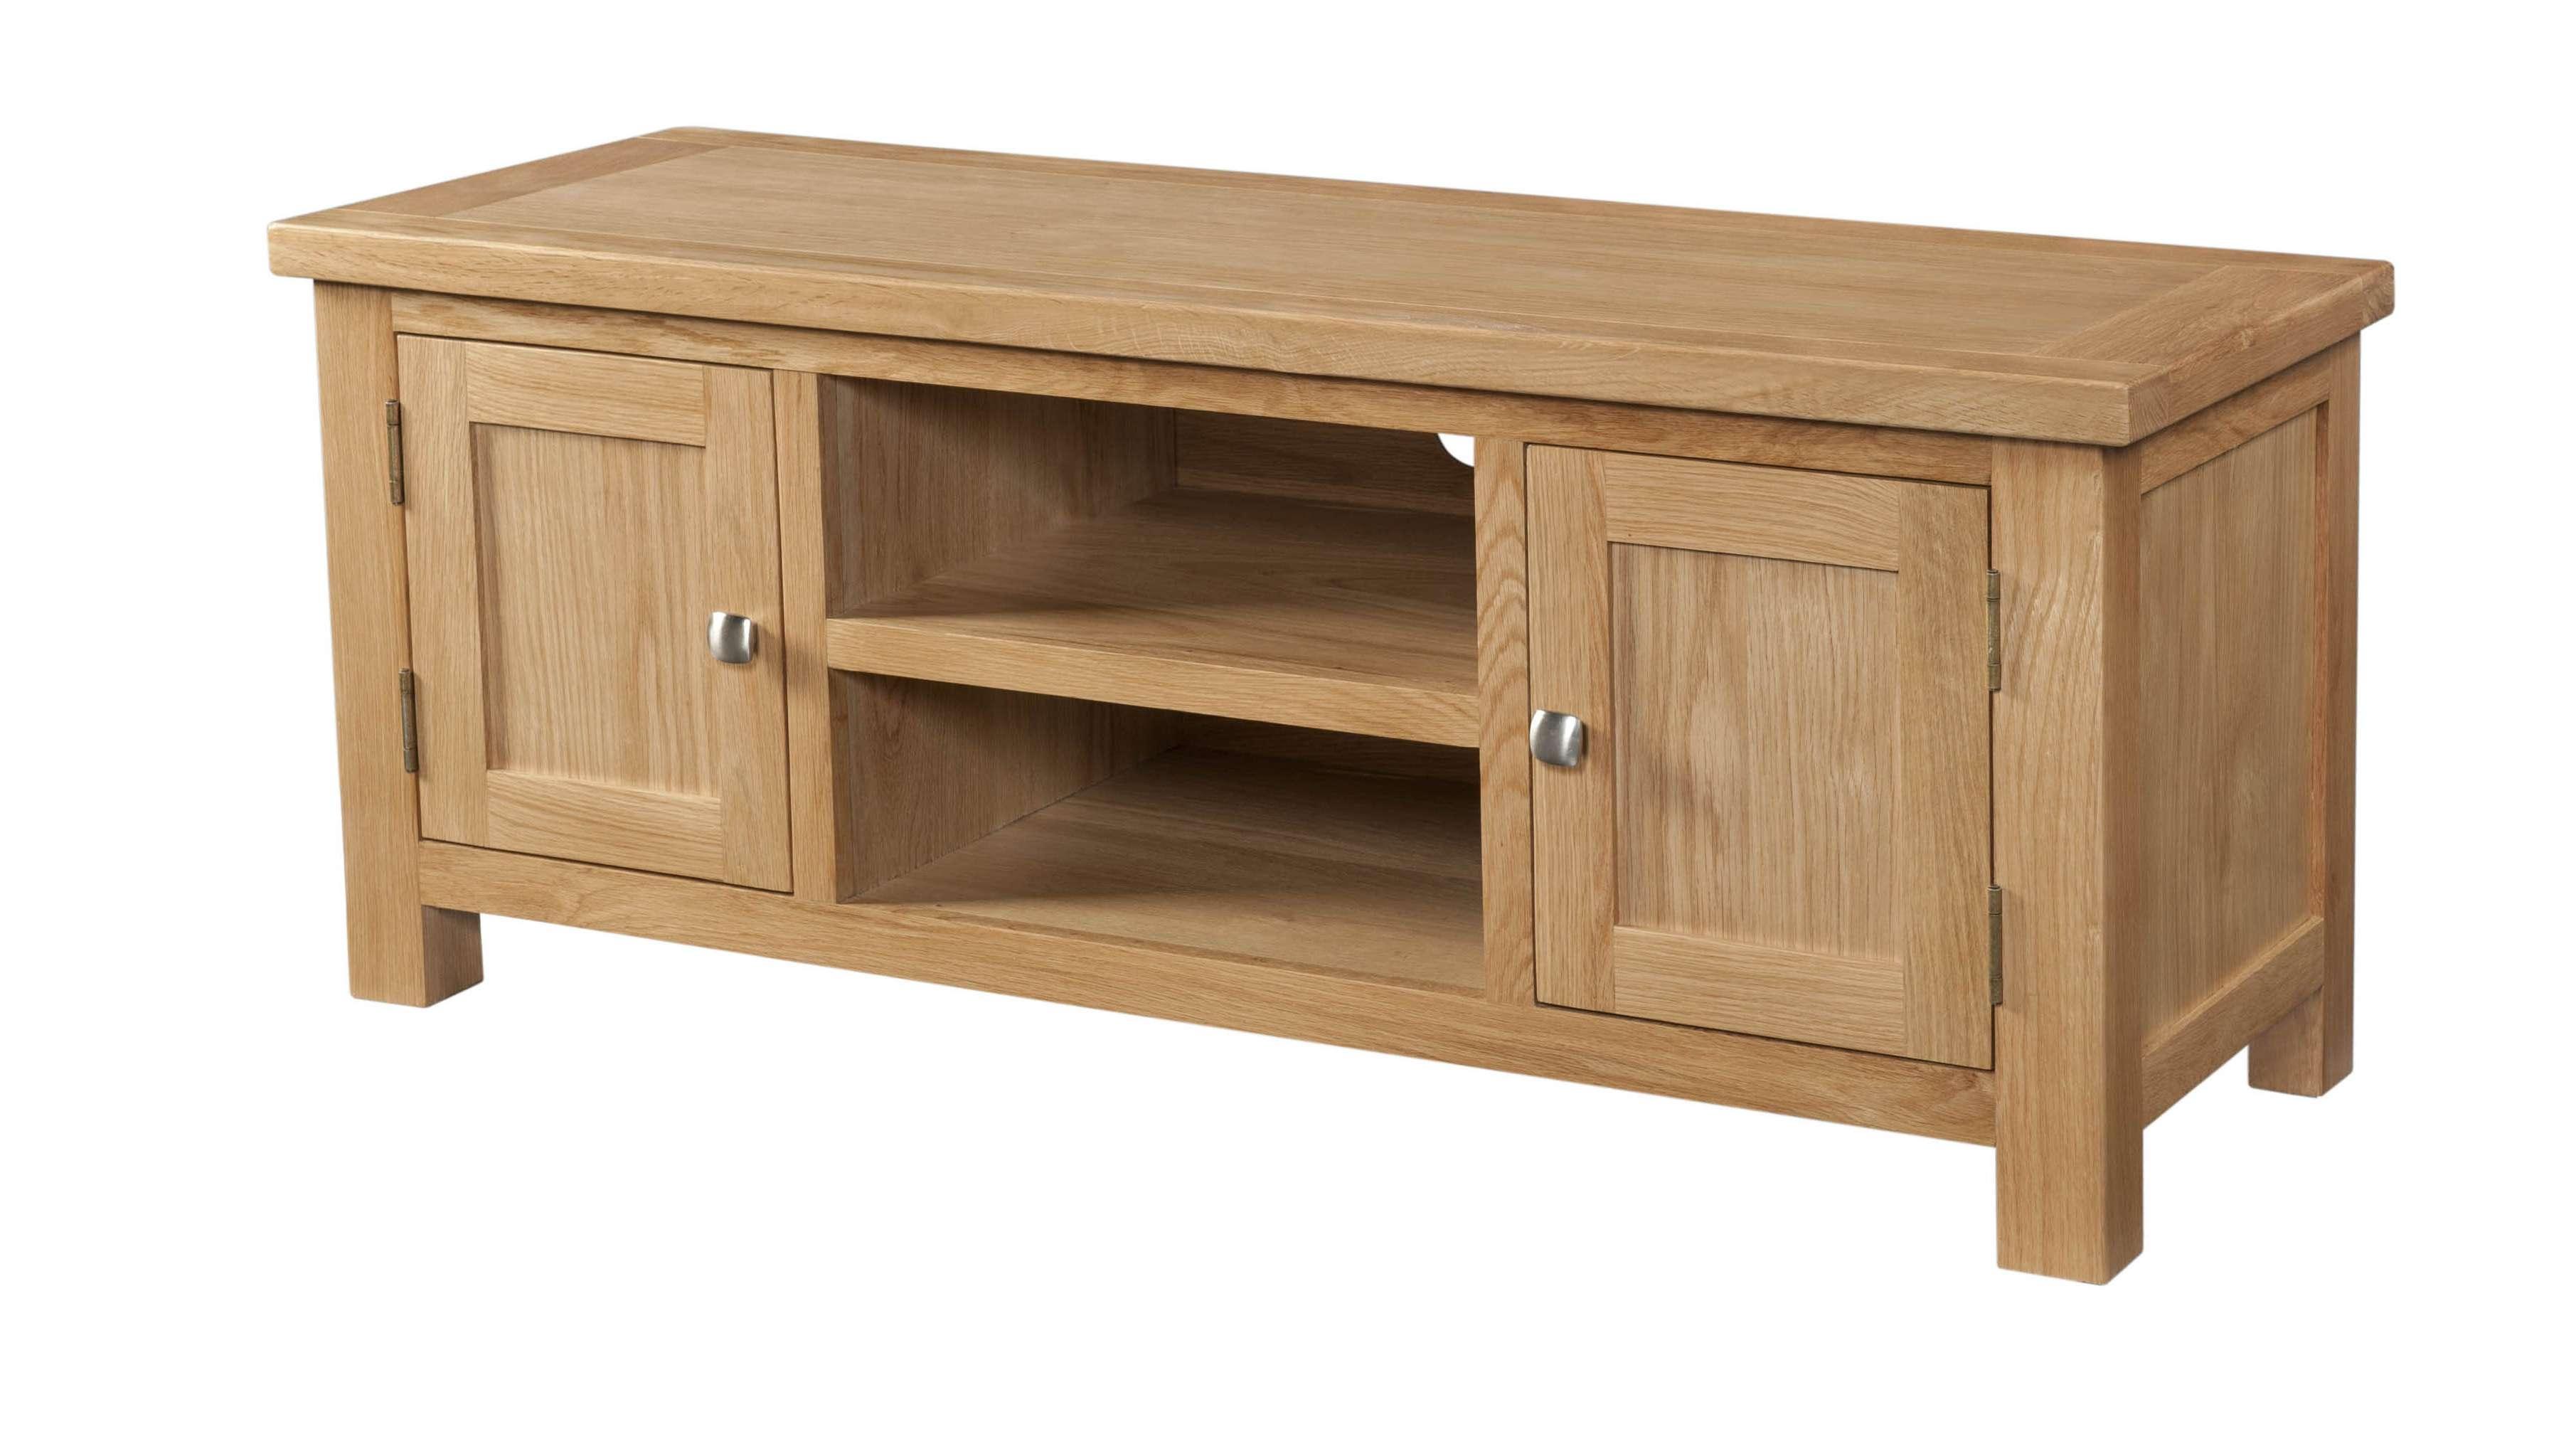 Dorset Large Oak Tv Cabinetdorset Large Oak Tv Cabinet – Branches For Large Oak Tv Cabinets (View 11 of 20)